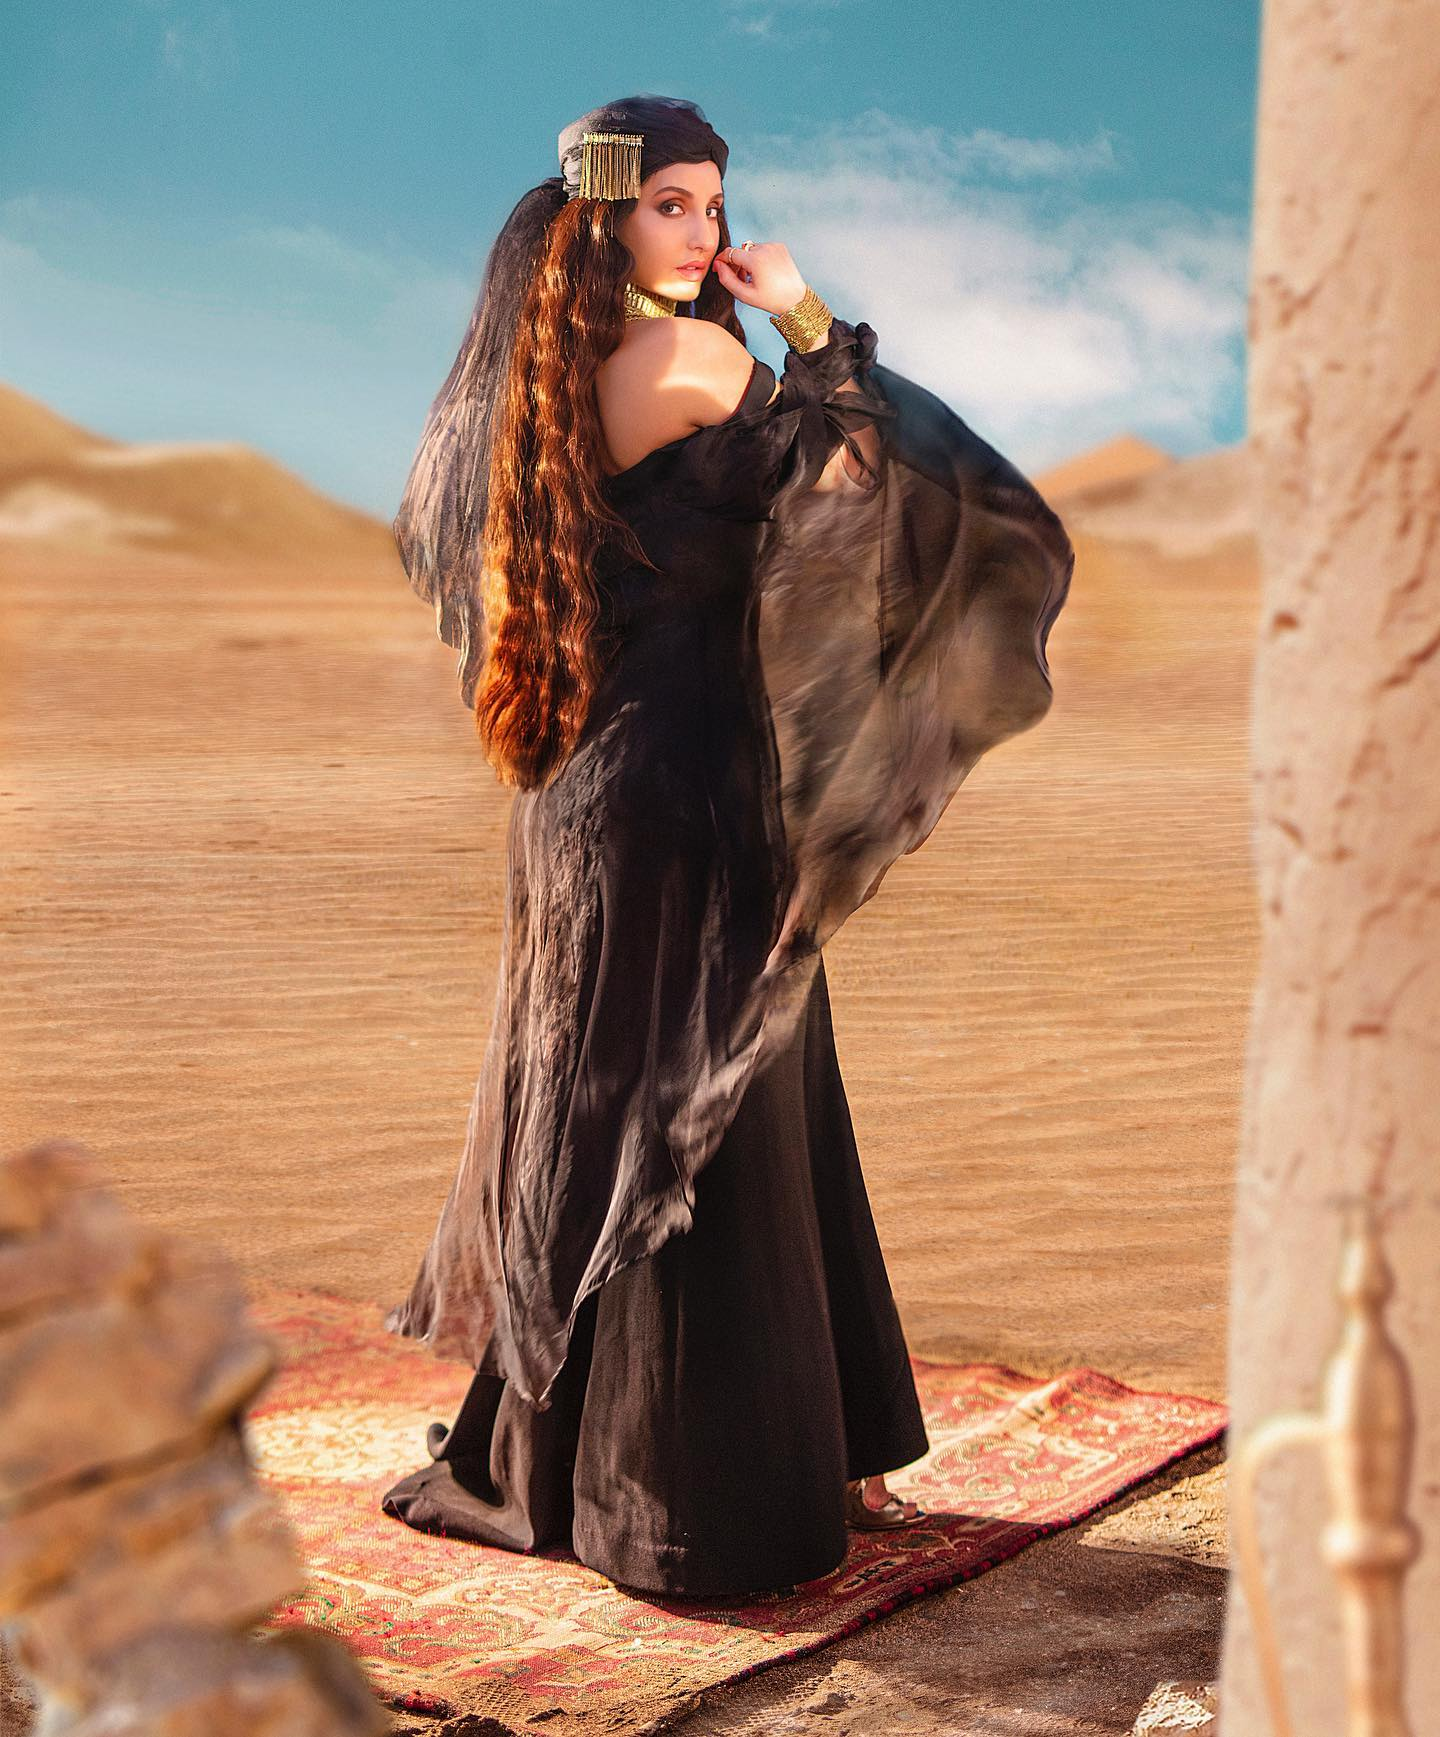 Nora Fatehi HD Image - Photo Download | HD Wallpaper Download